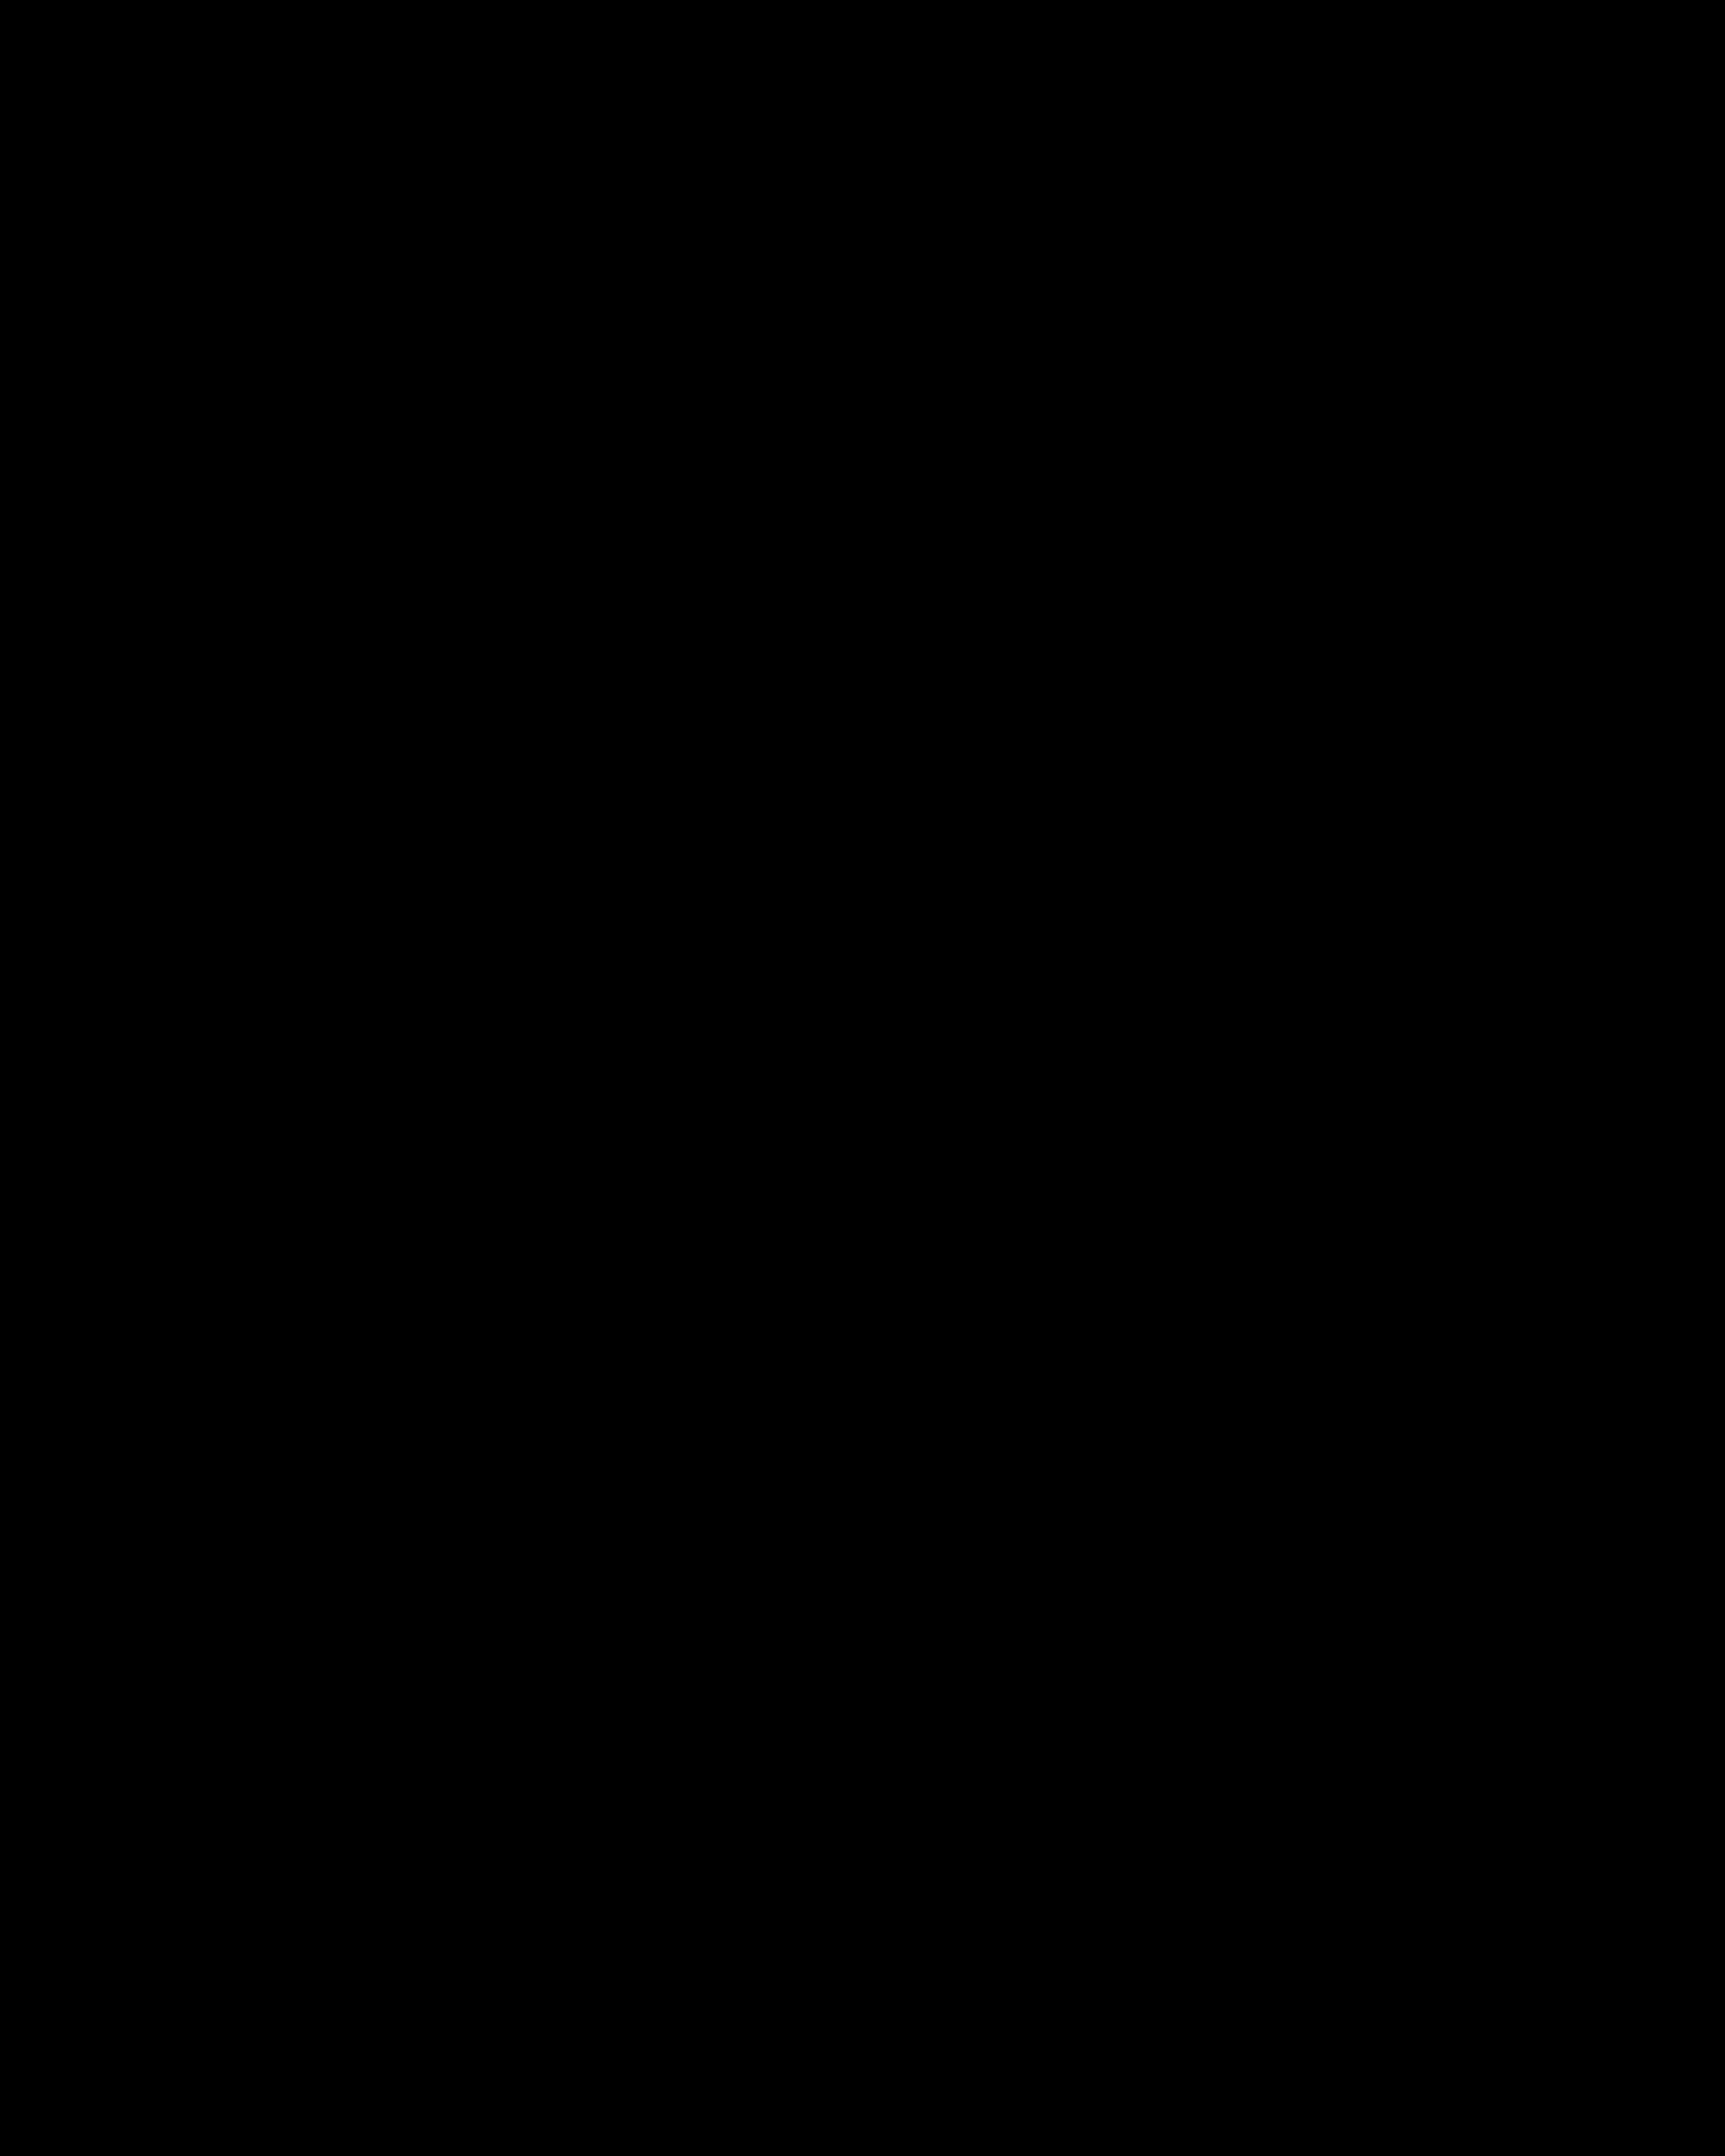 olivia-gaston